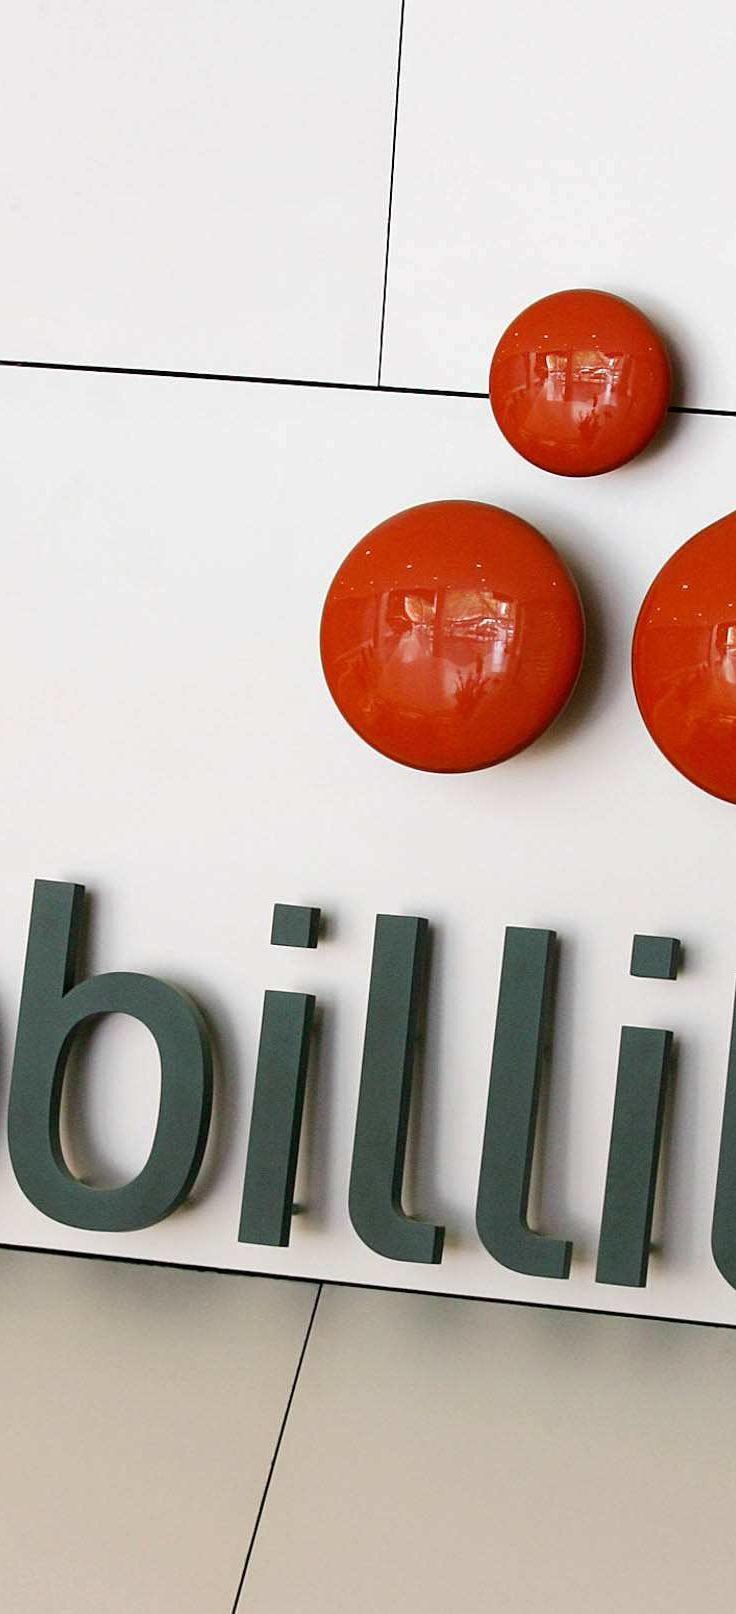 Trade alert: BHP Billiton PLC